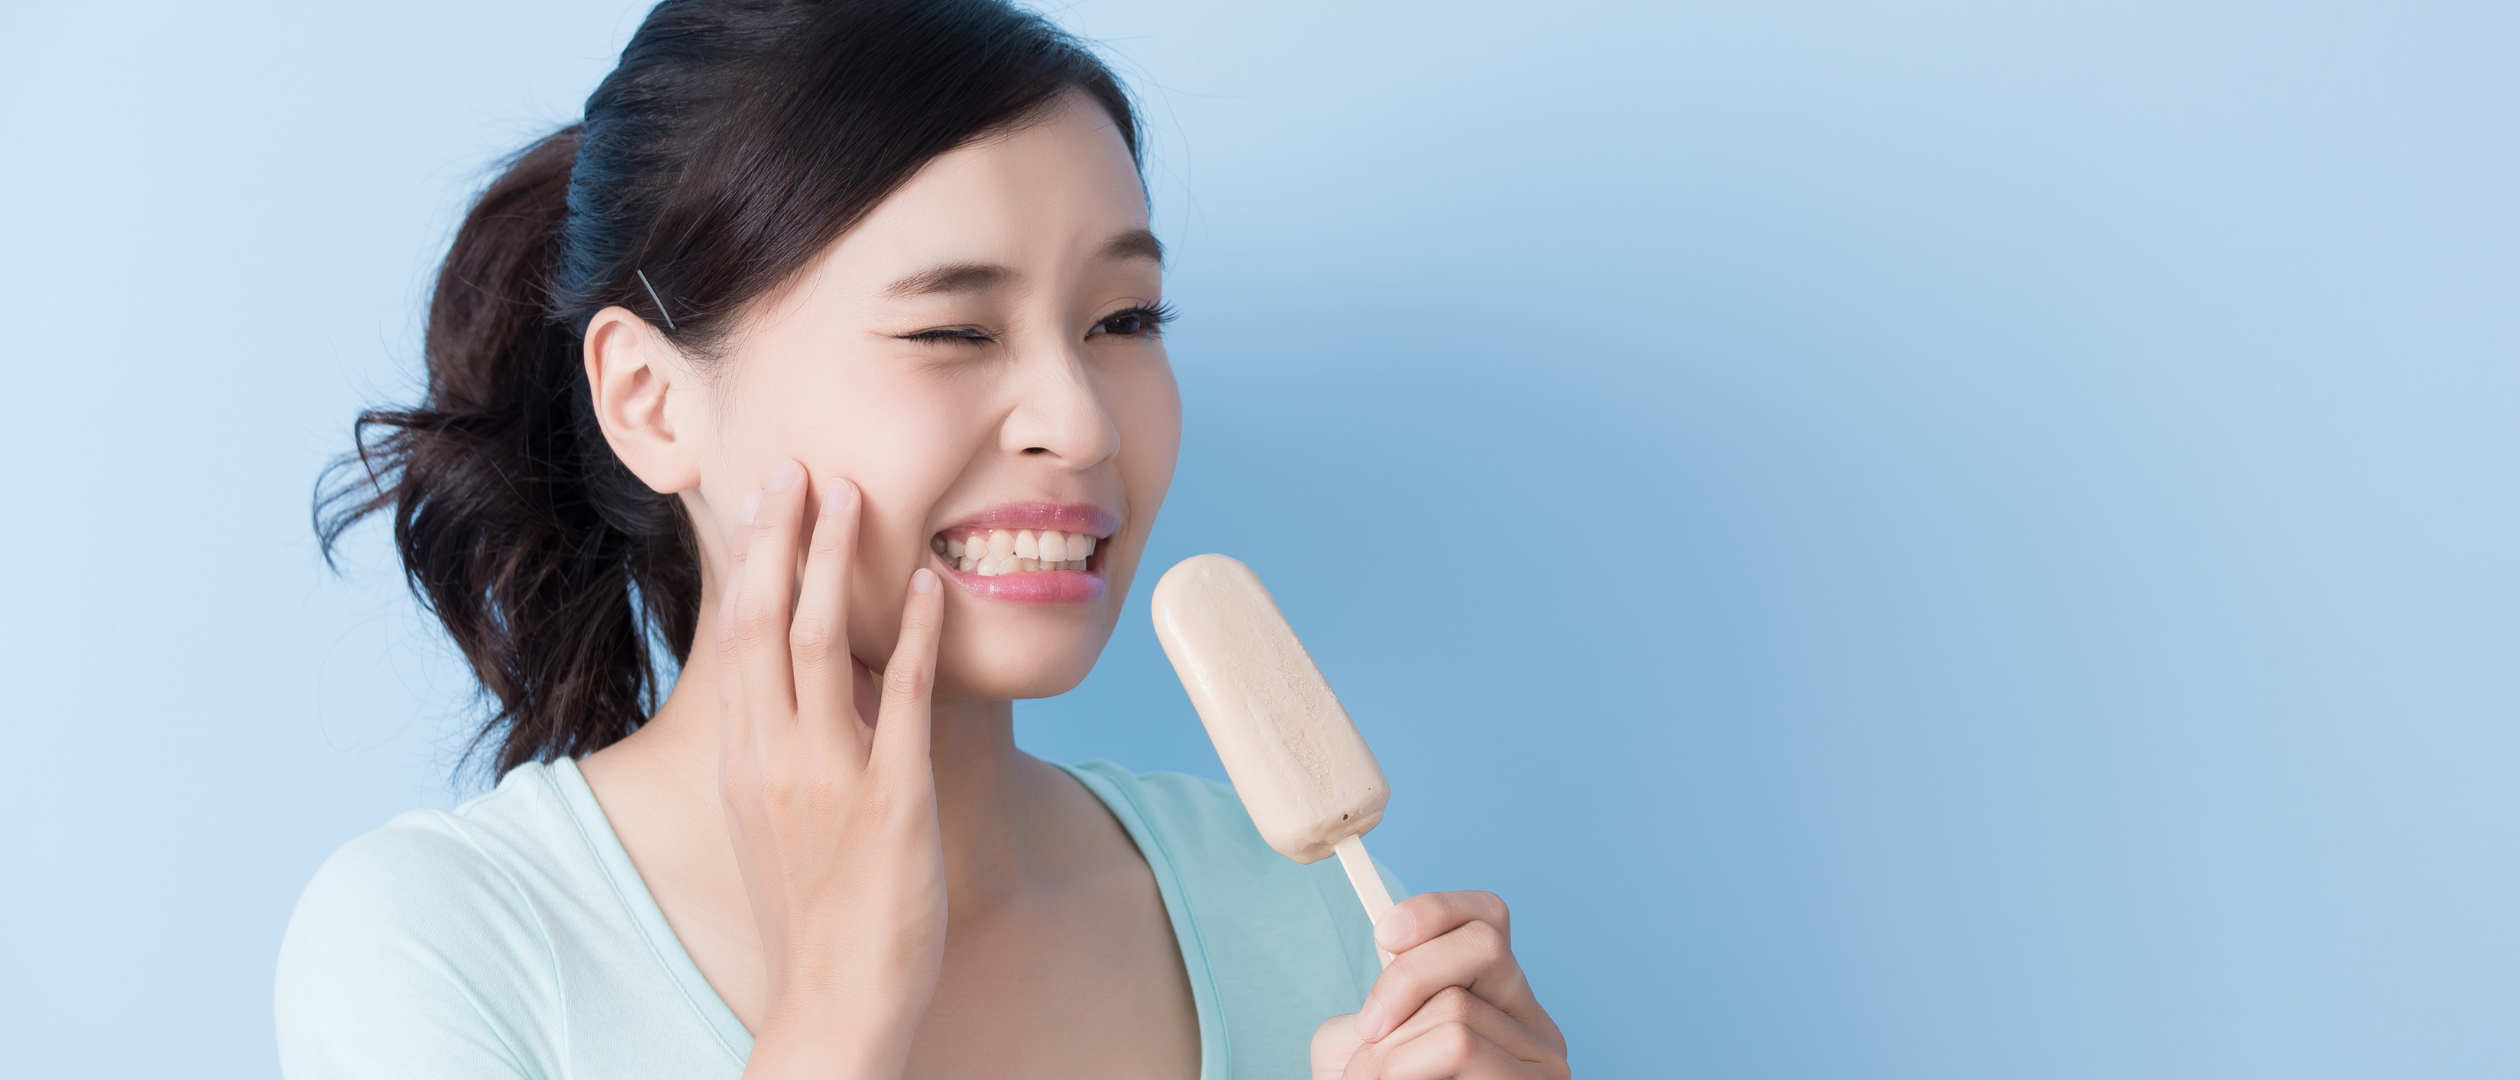 Dr. Blum Remedies for Sensitive Teeth